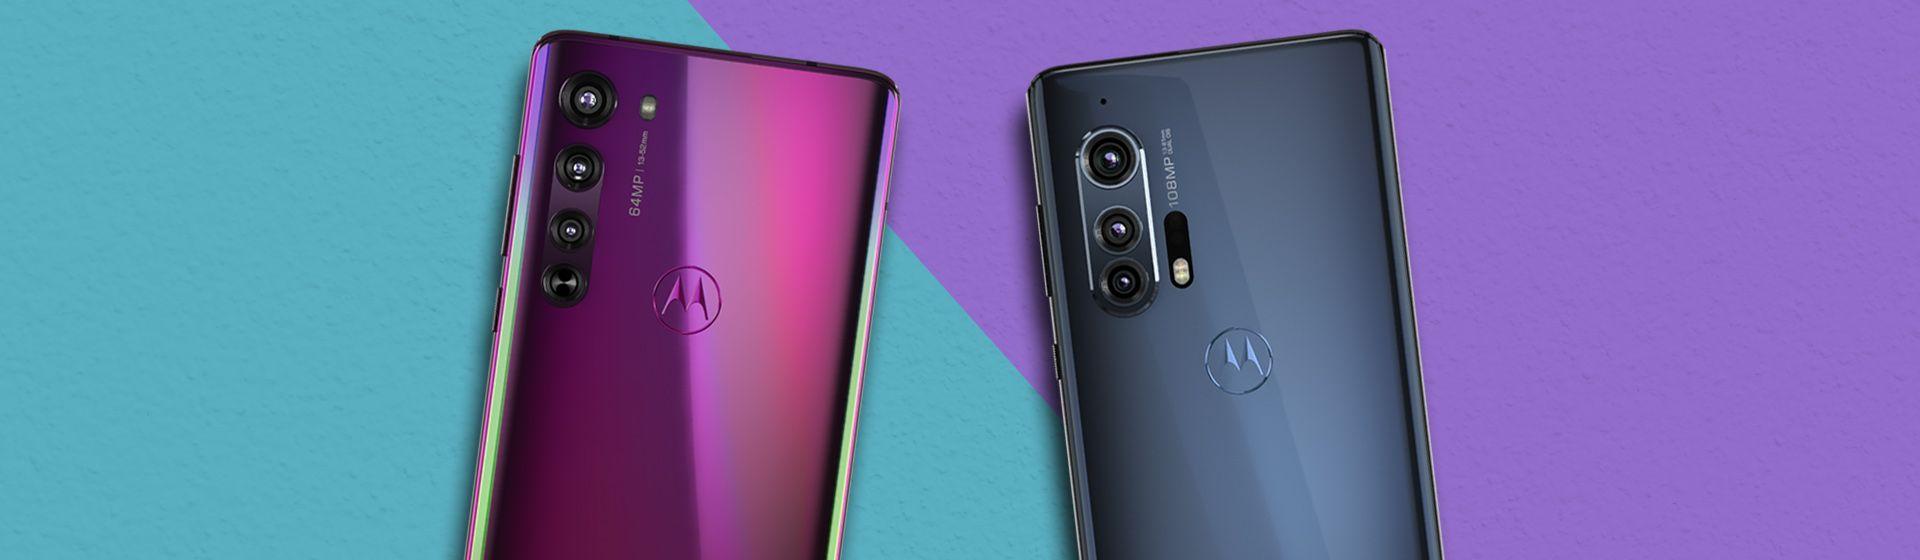 Motorola Edge vs Edge+: entenda as diferenças entre os celulares